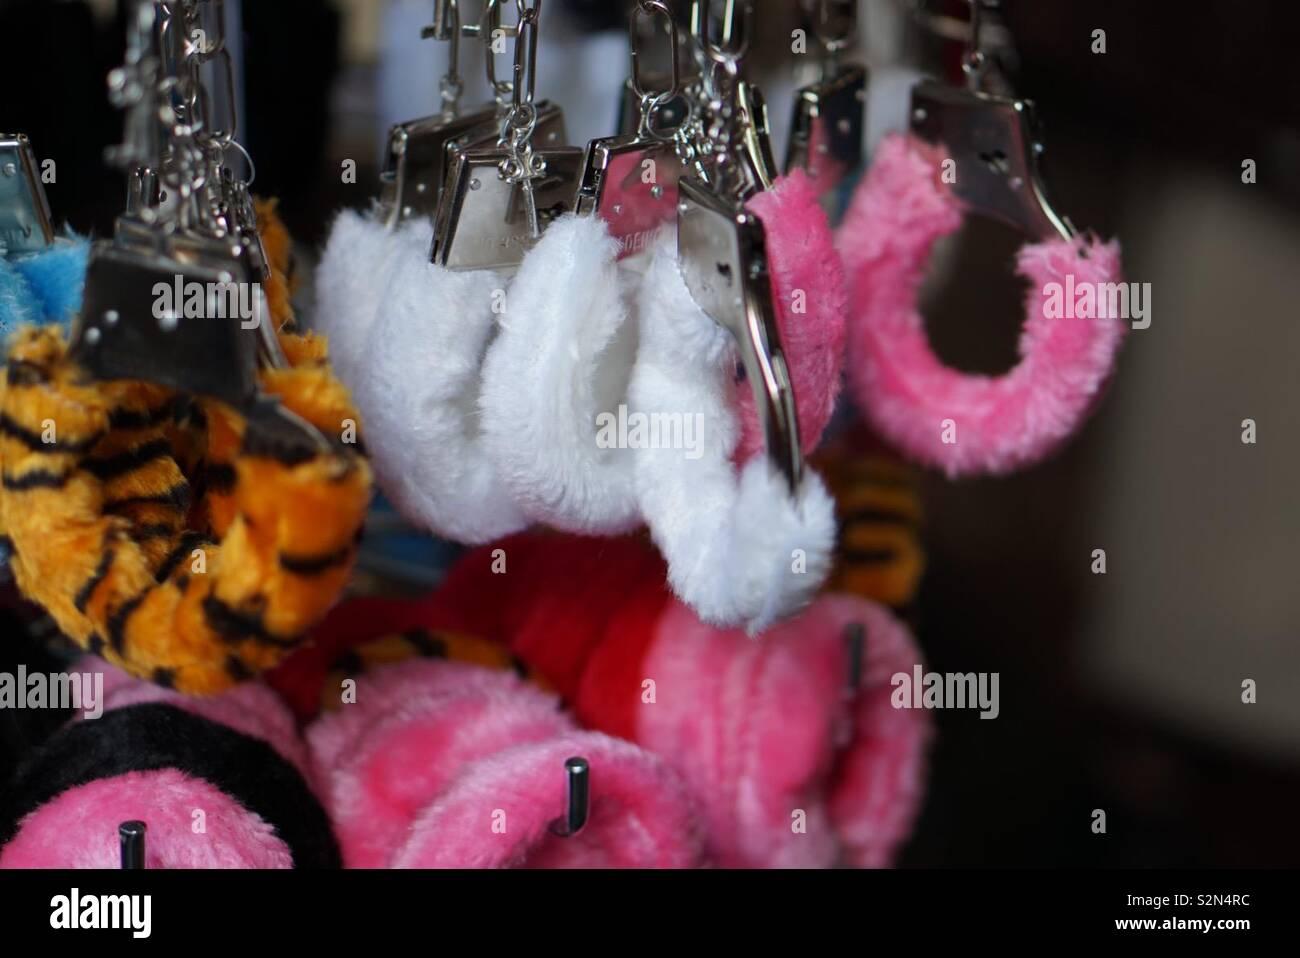 Fluffy Handcuffs for sale, Camden Market (London) - Stock Image